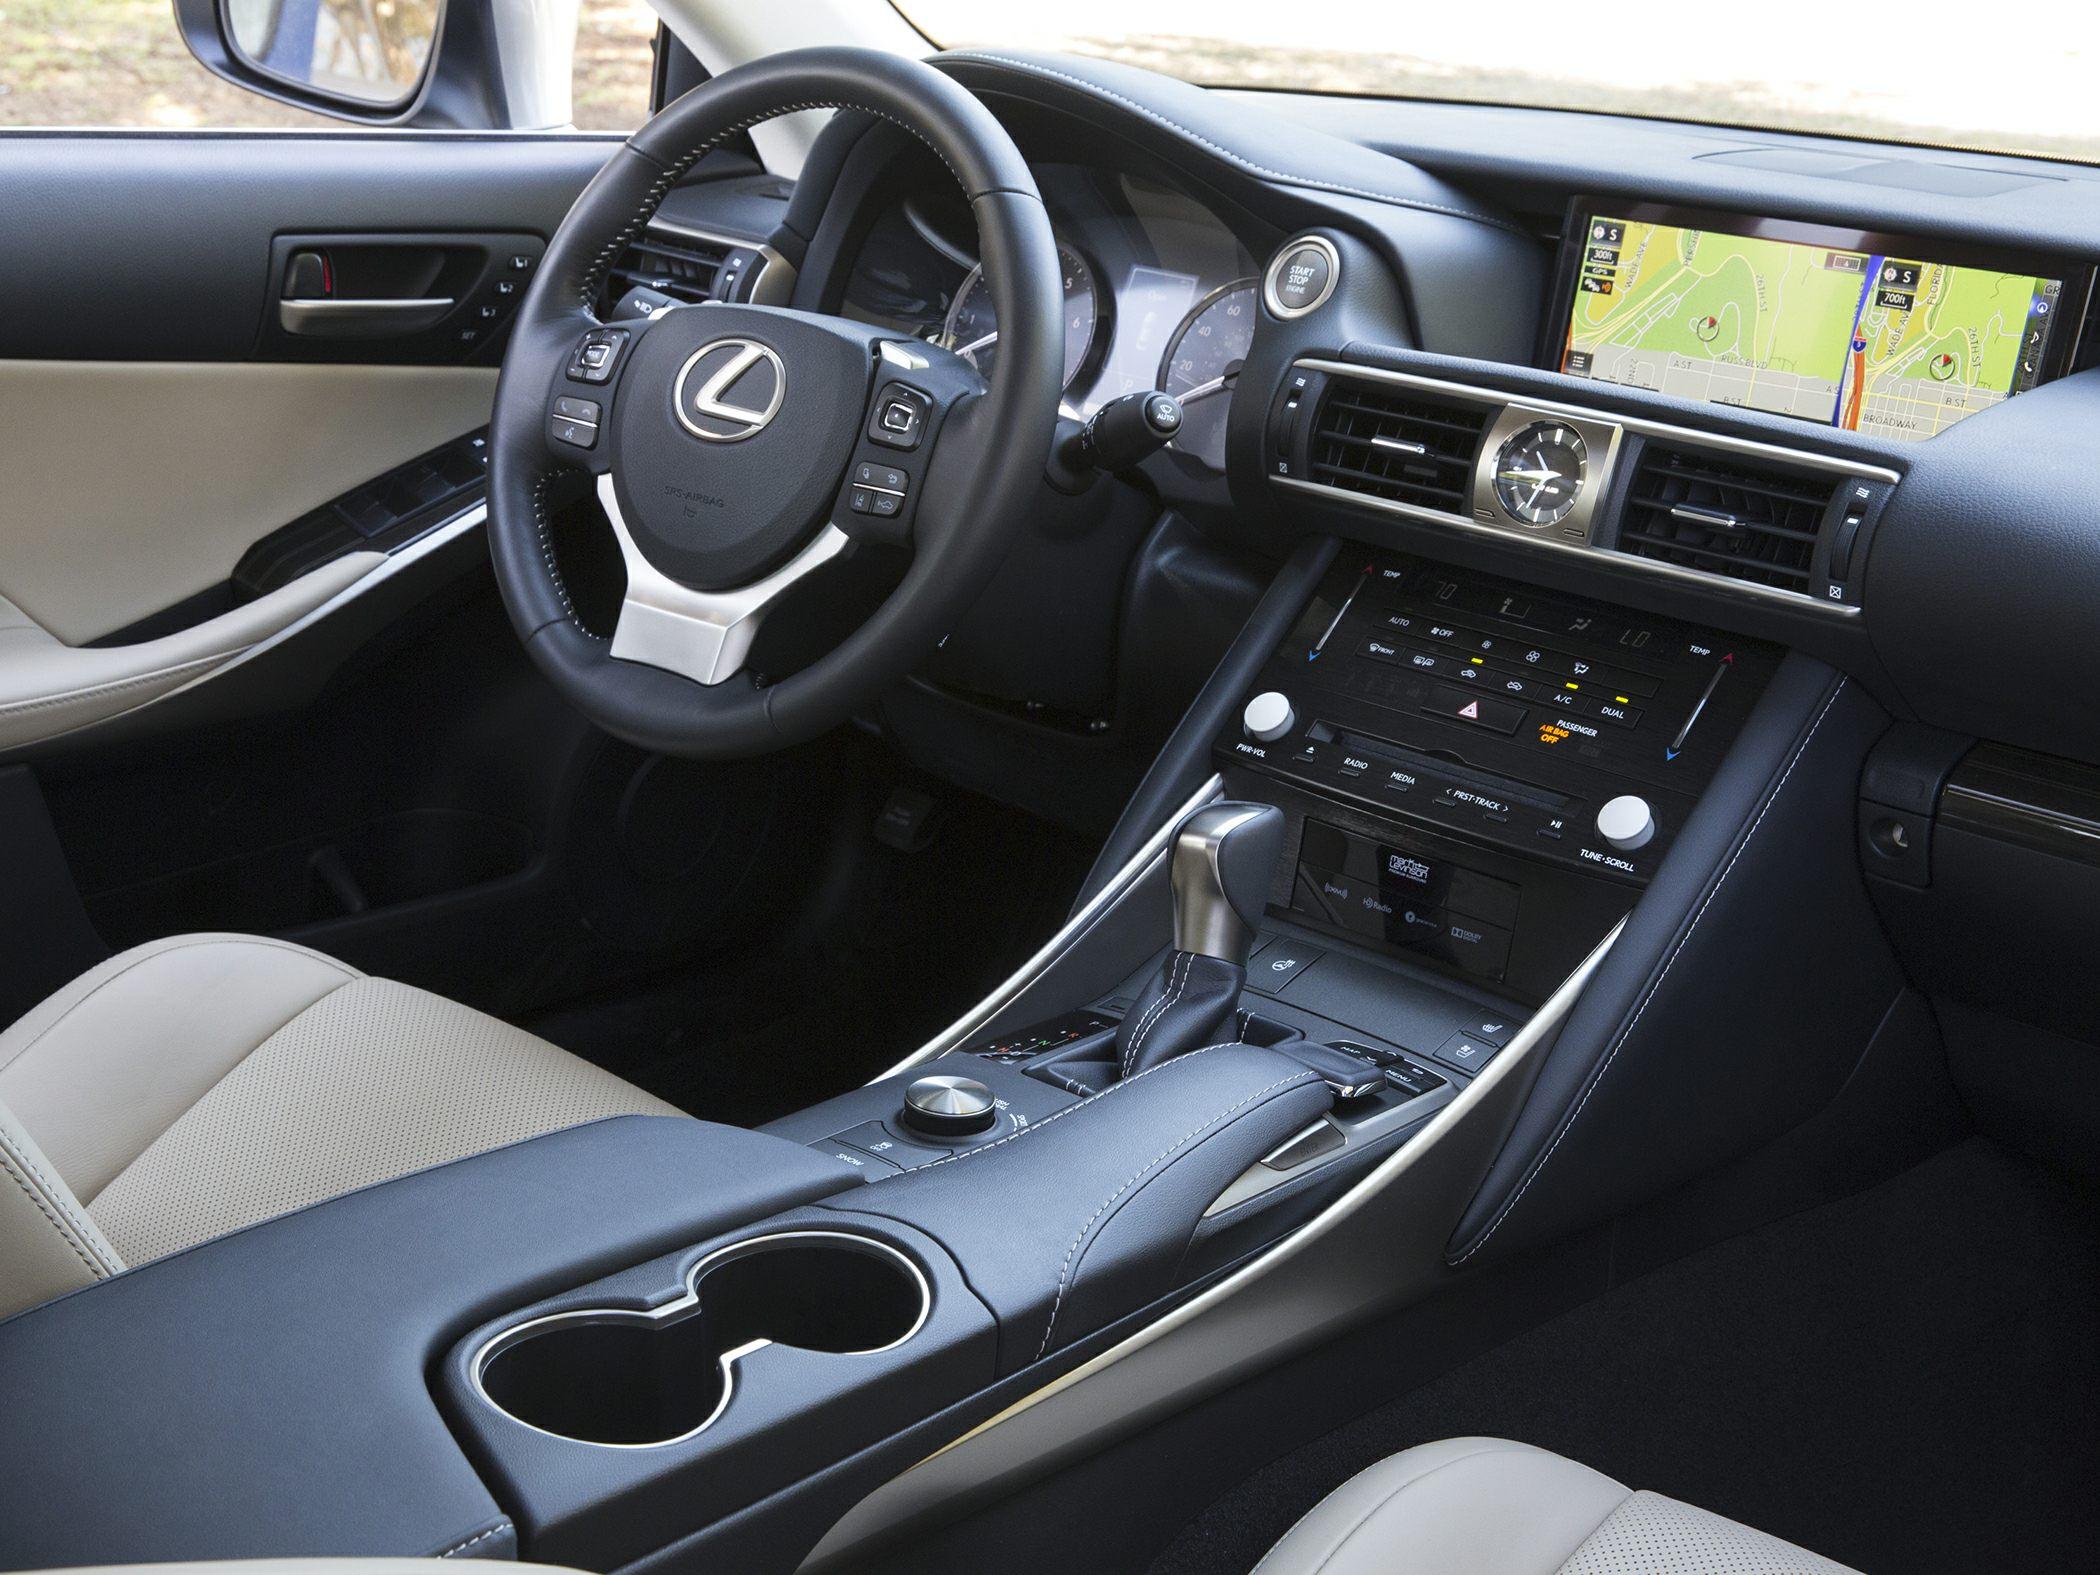 2017 Lexus IS 200t Base 4 Dr Sedan at Lexus of Lakeridge